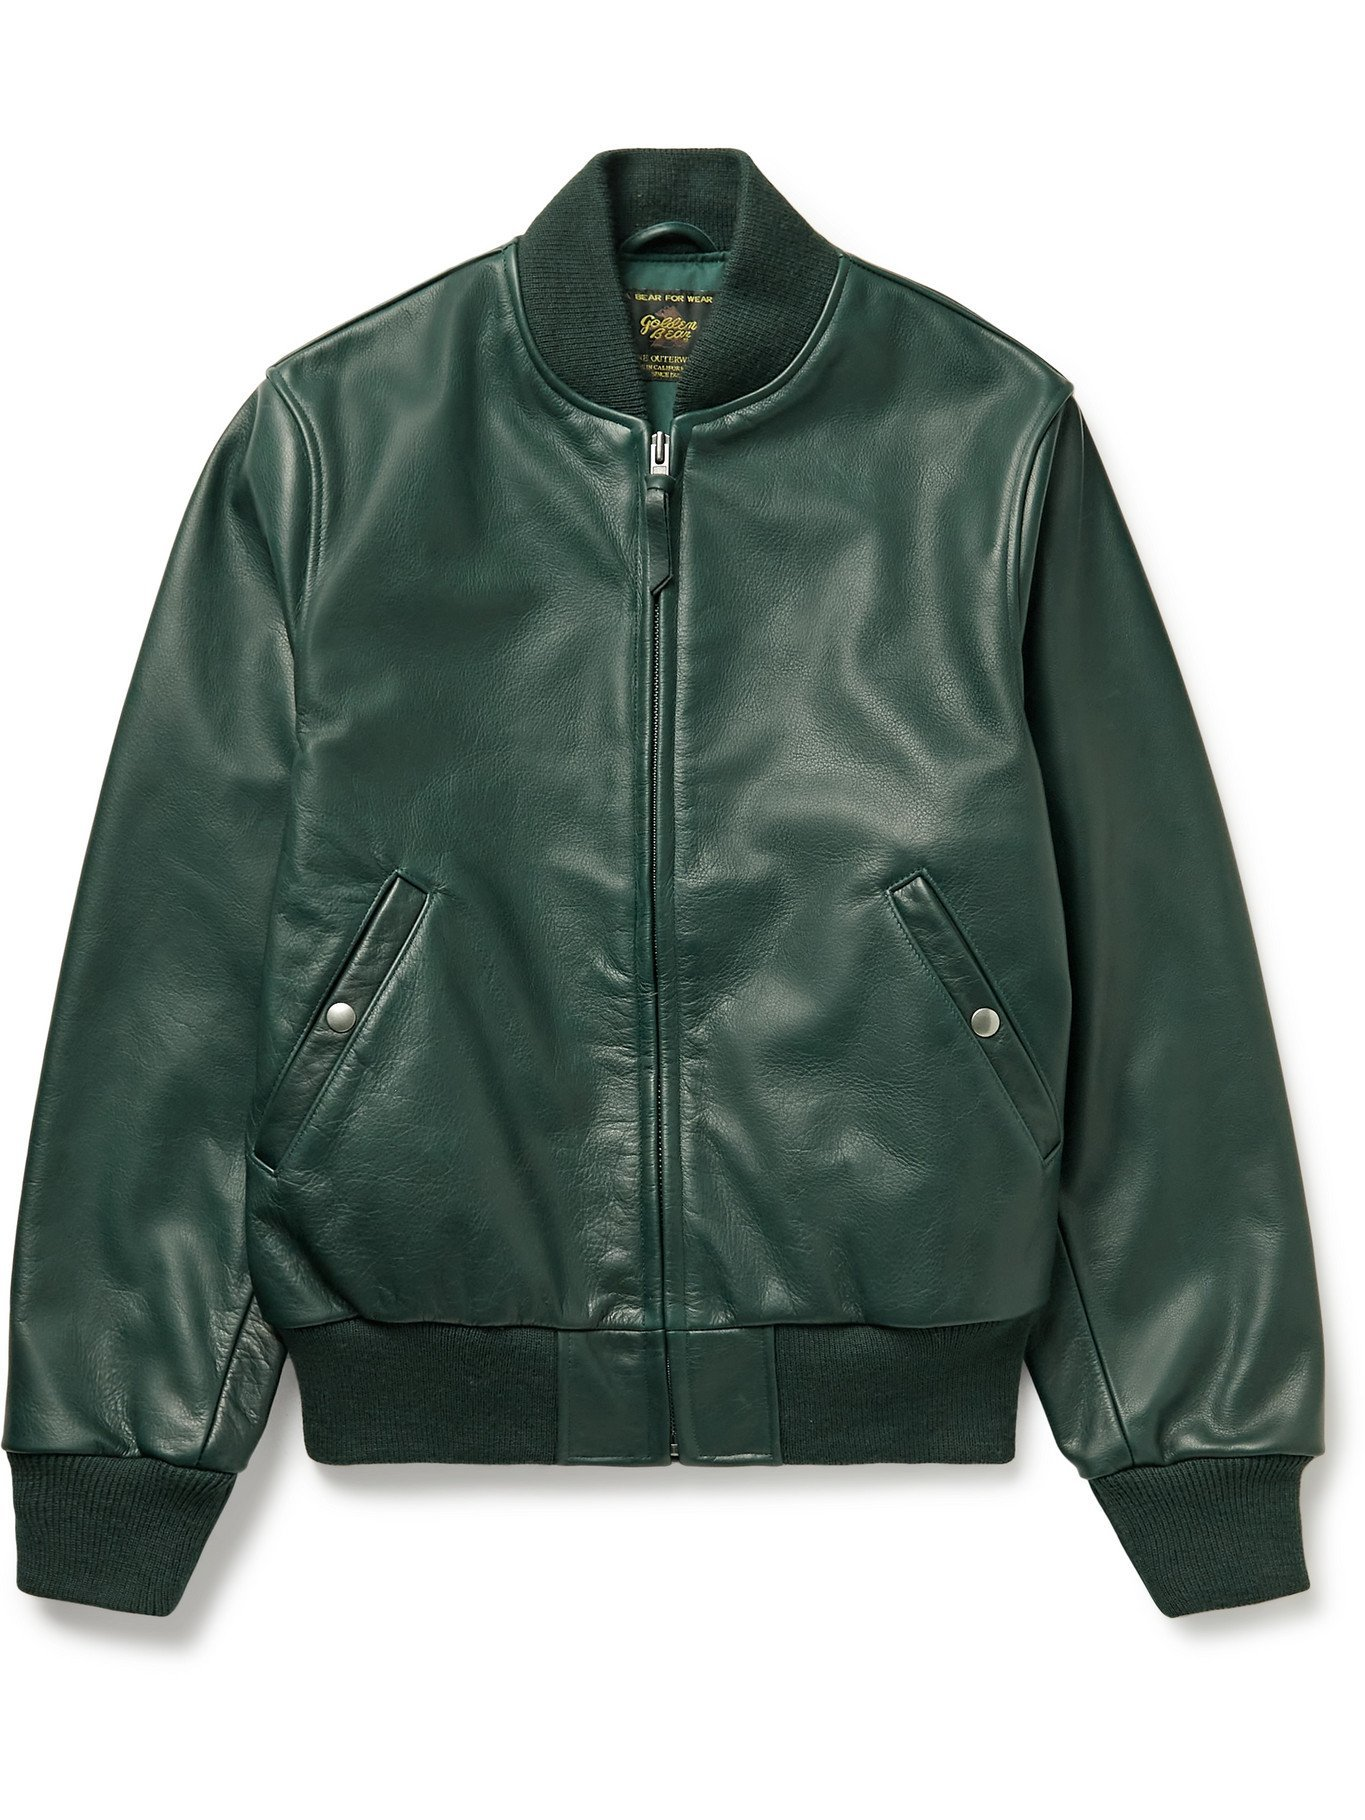 Photo: GOLDEN BEAR - Leather Bomber Jacket - Green - XS